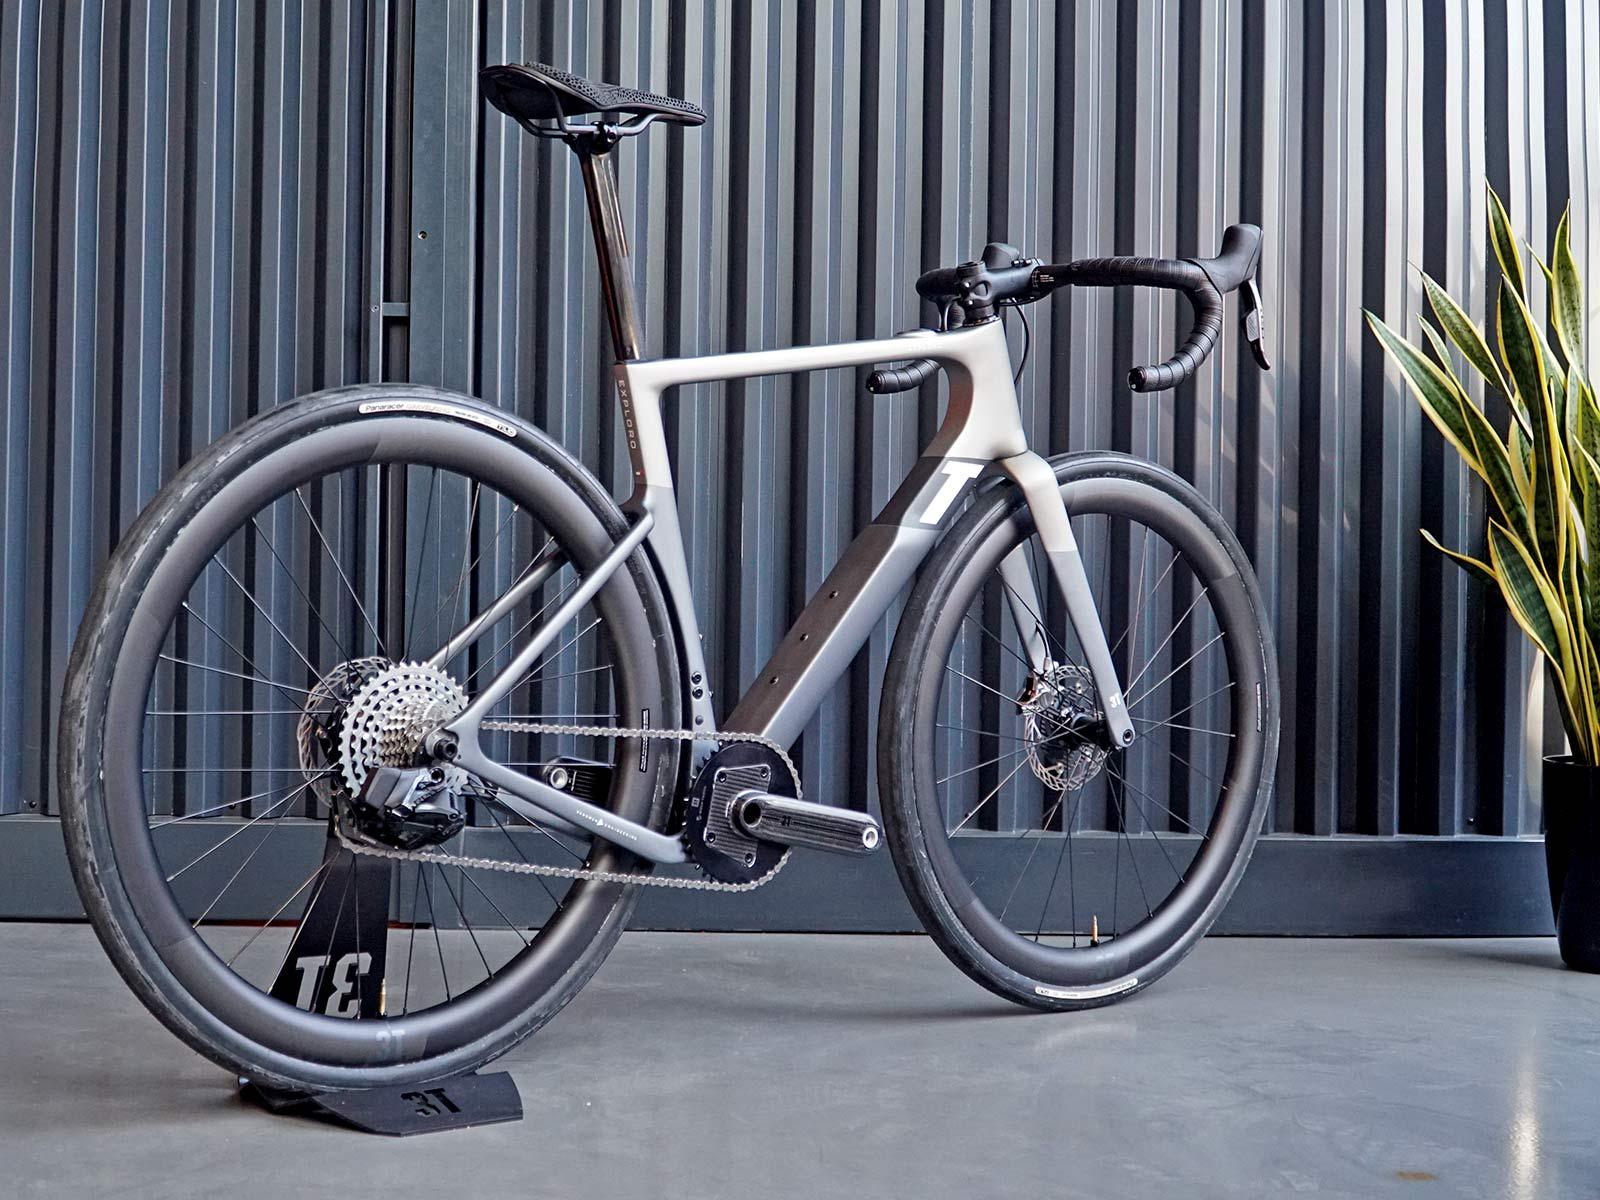 3T Exploro RaceMax Boost gravel e-bike, stealth ebikemotion X35 pedal-assist,Ultralight